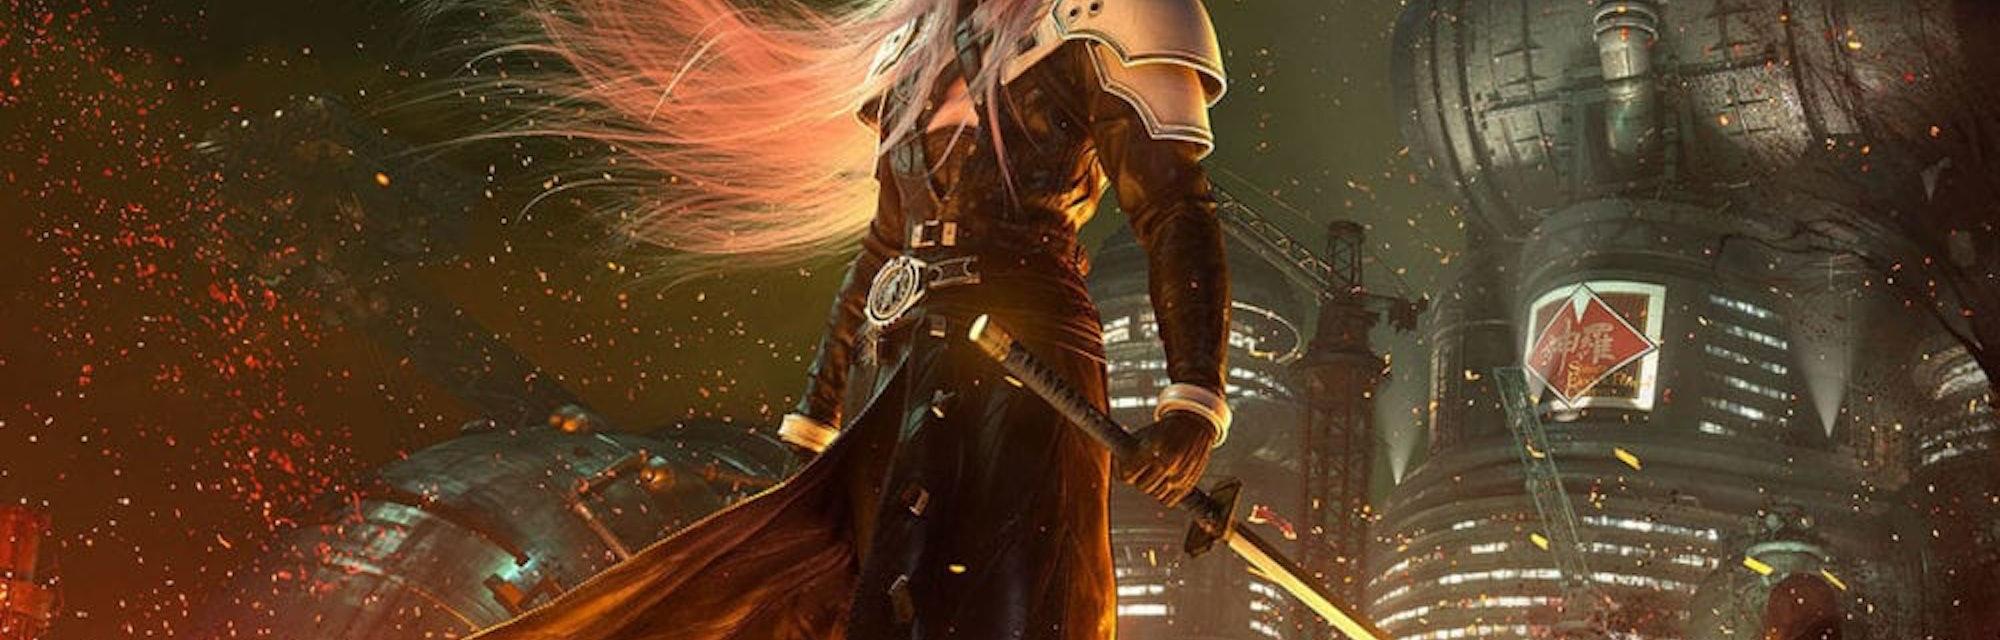 Final Fantasy 7 Remake Demo Secret Ending How To Unlock The